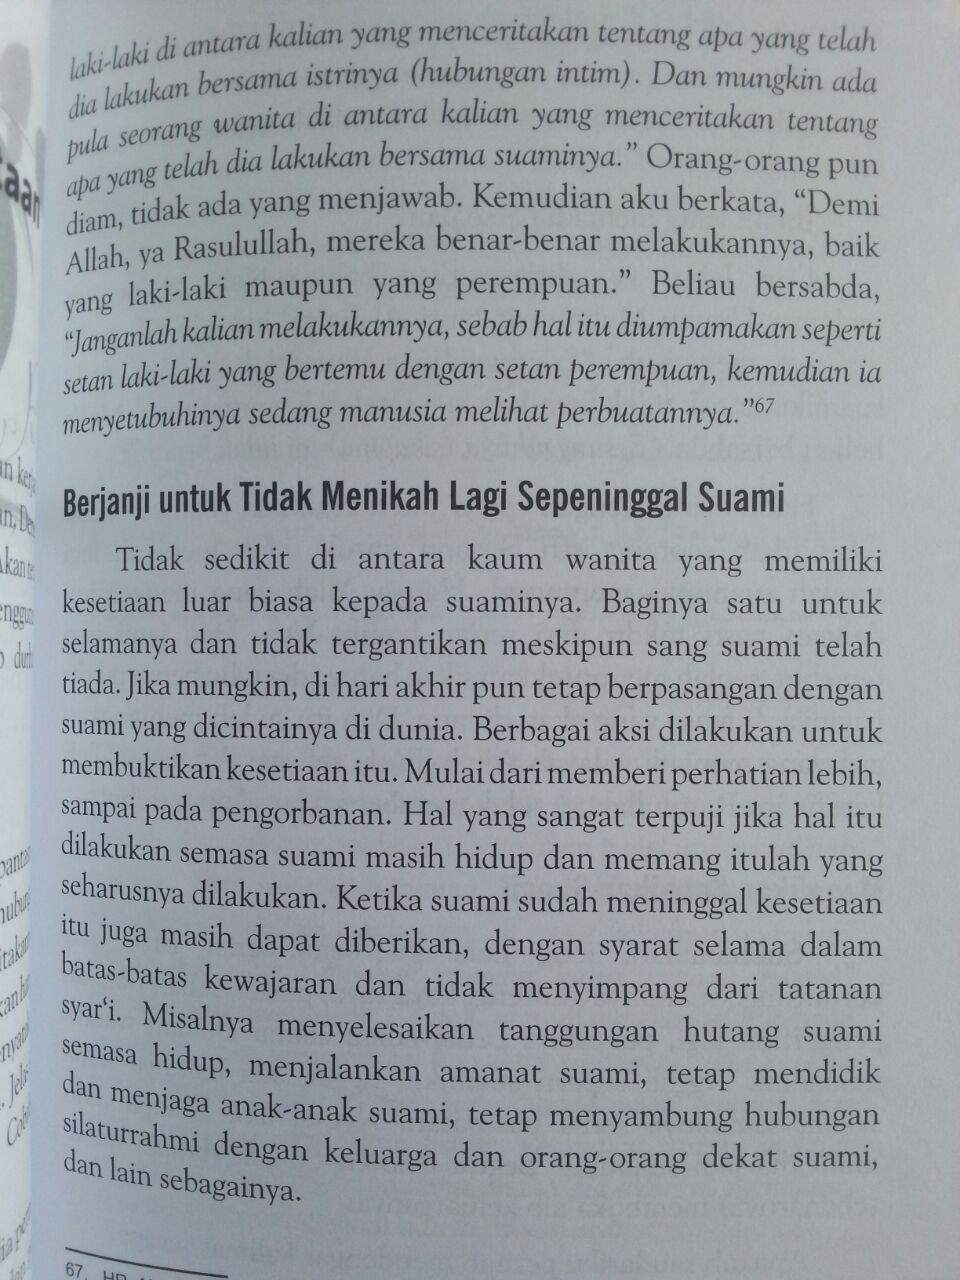 Buku Dosa-Dosa Yang Digemari Wanita Indonesia isi 3